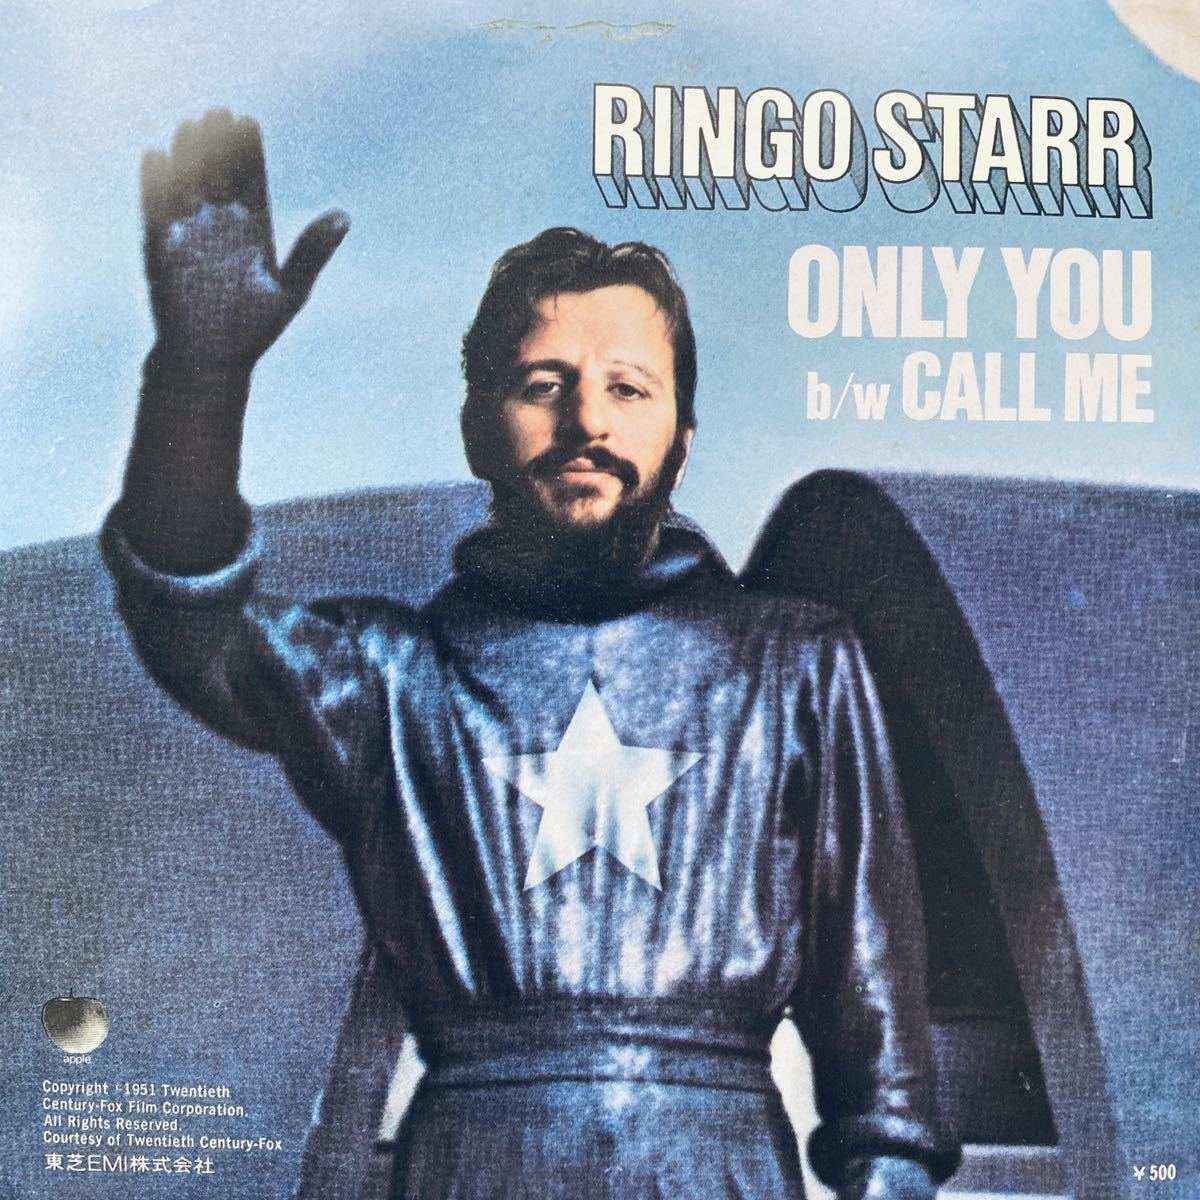 EP / リンゴ・スター - オンリー・ユー / 国内見本盤白ラベル プロモ 非売品 EAR-10670 RINGO STARR - ONLY YOU / Apple ビートルズ_画像2